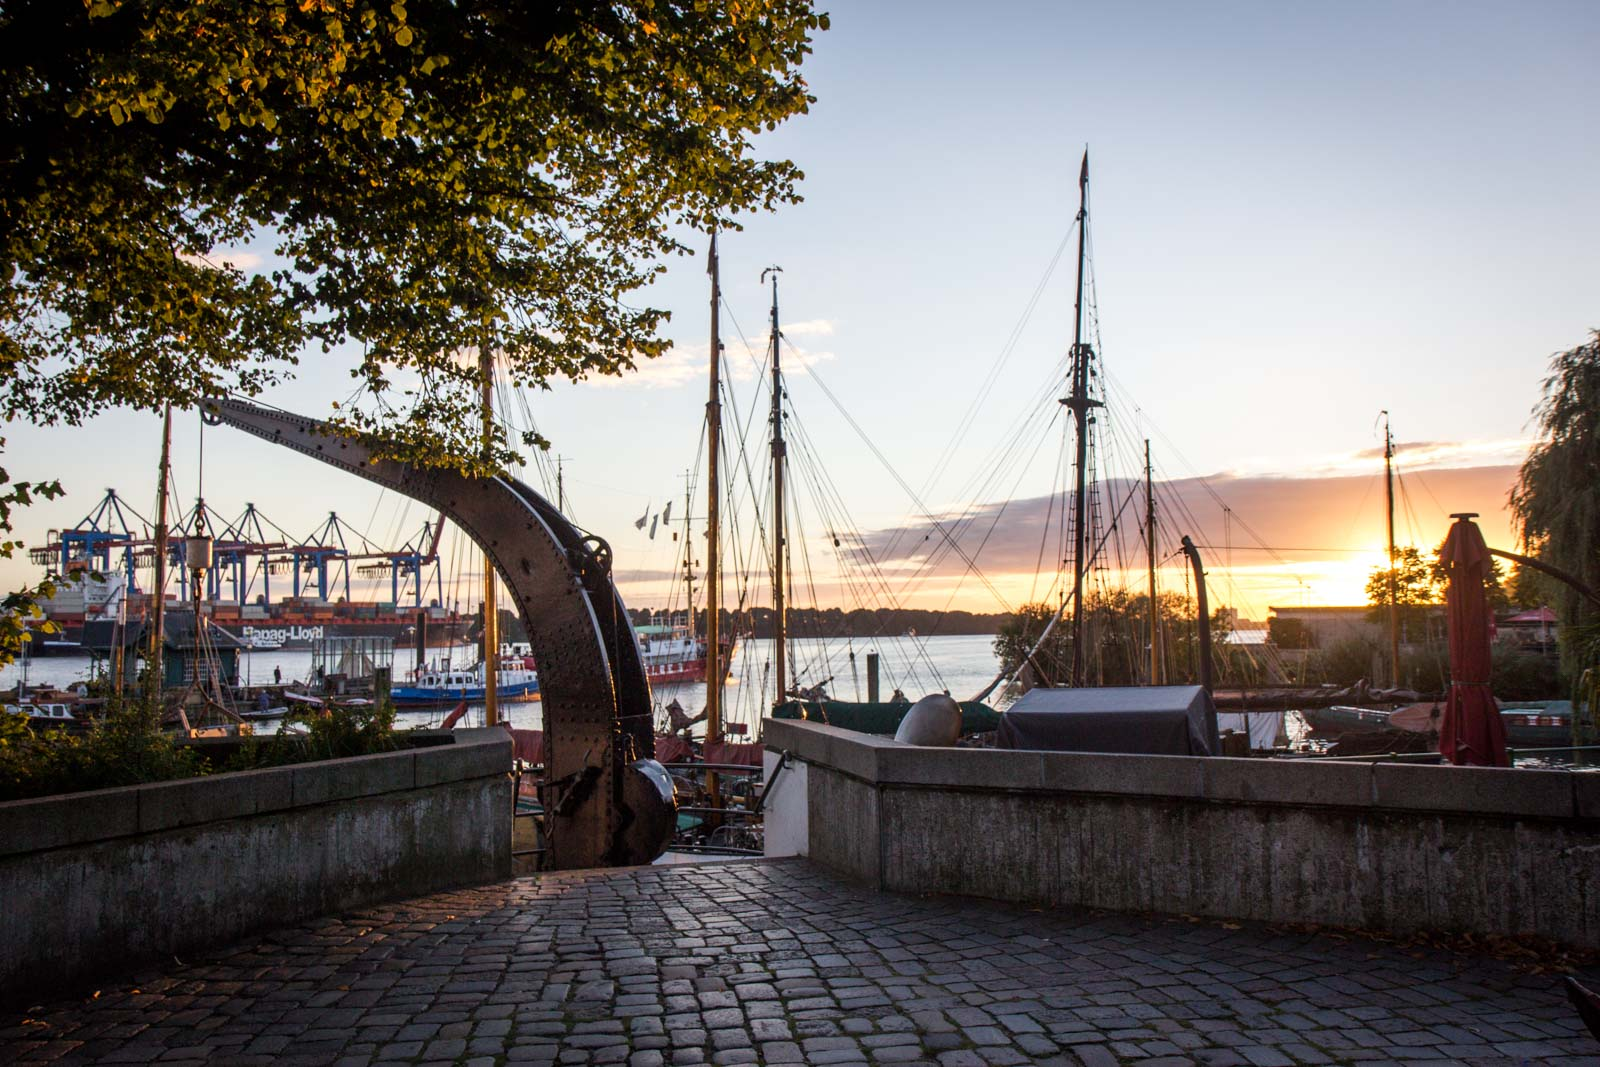 Hamburg's maritime history